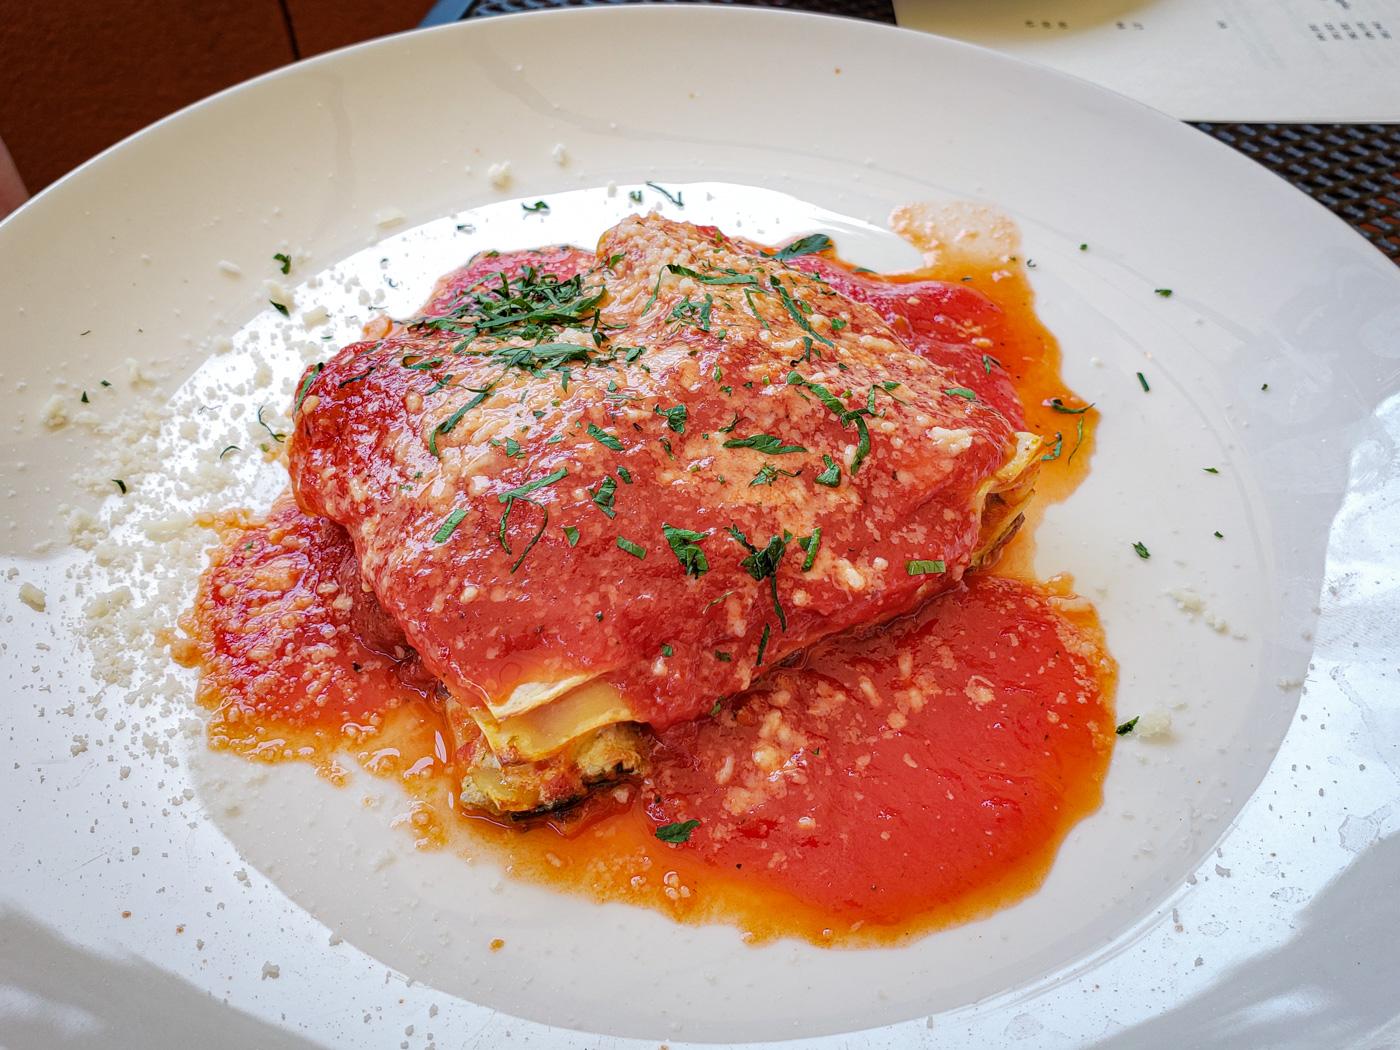 Lasagna at Le Virtù